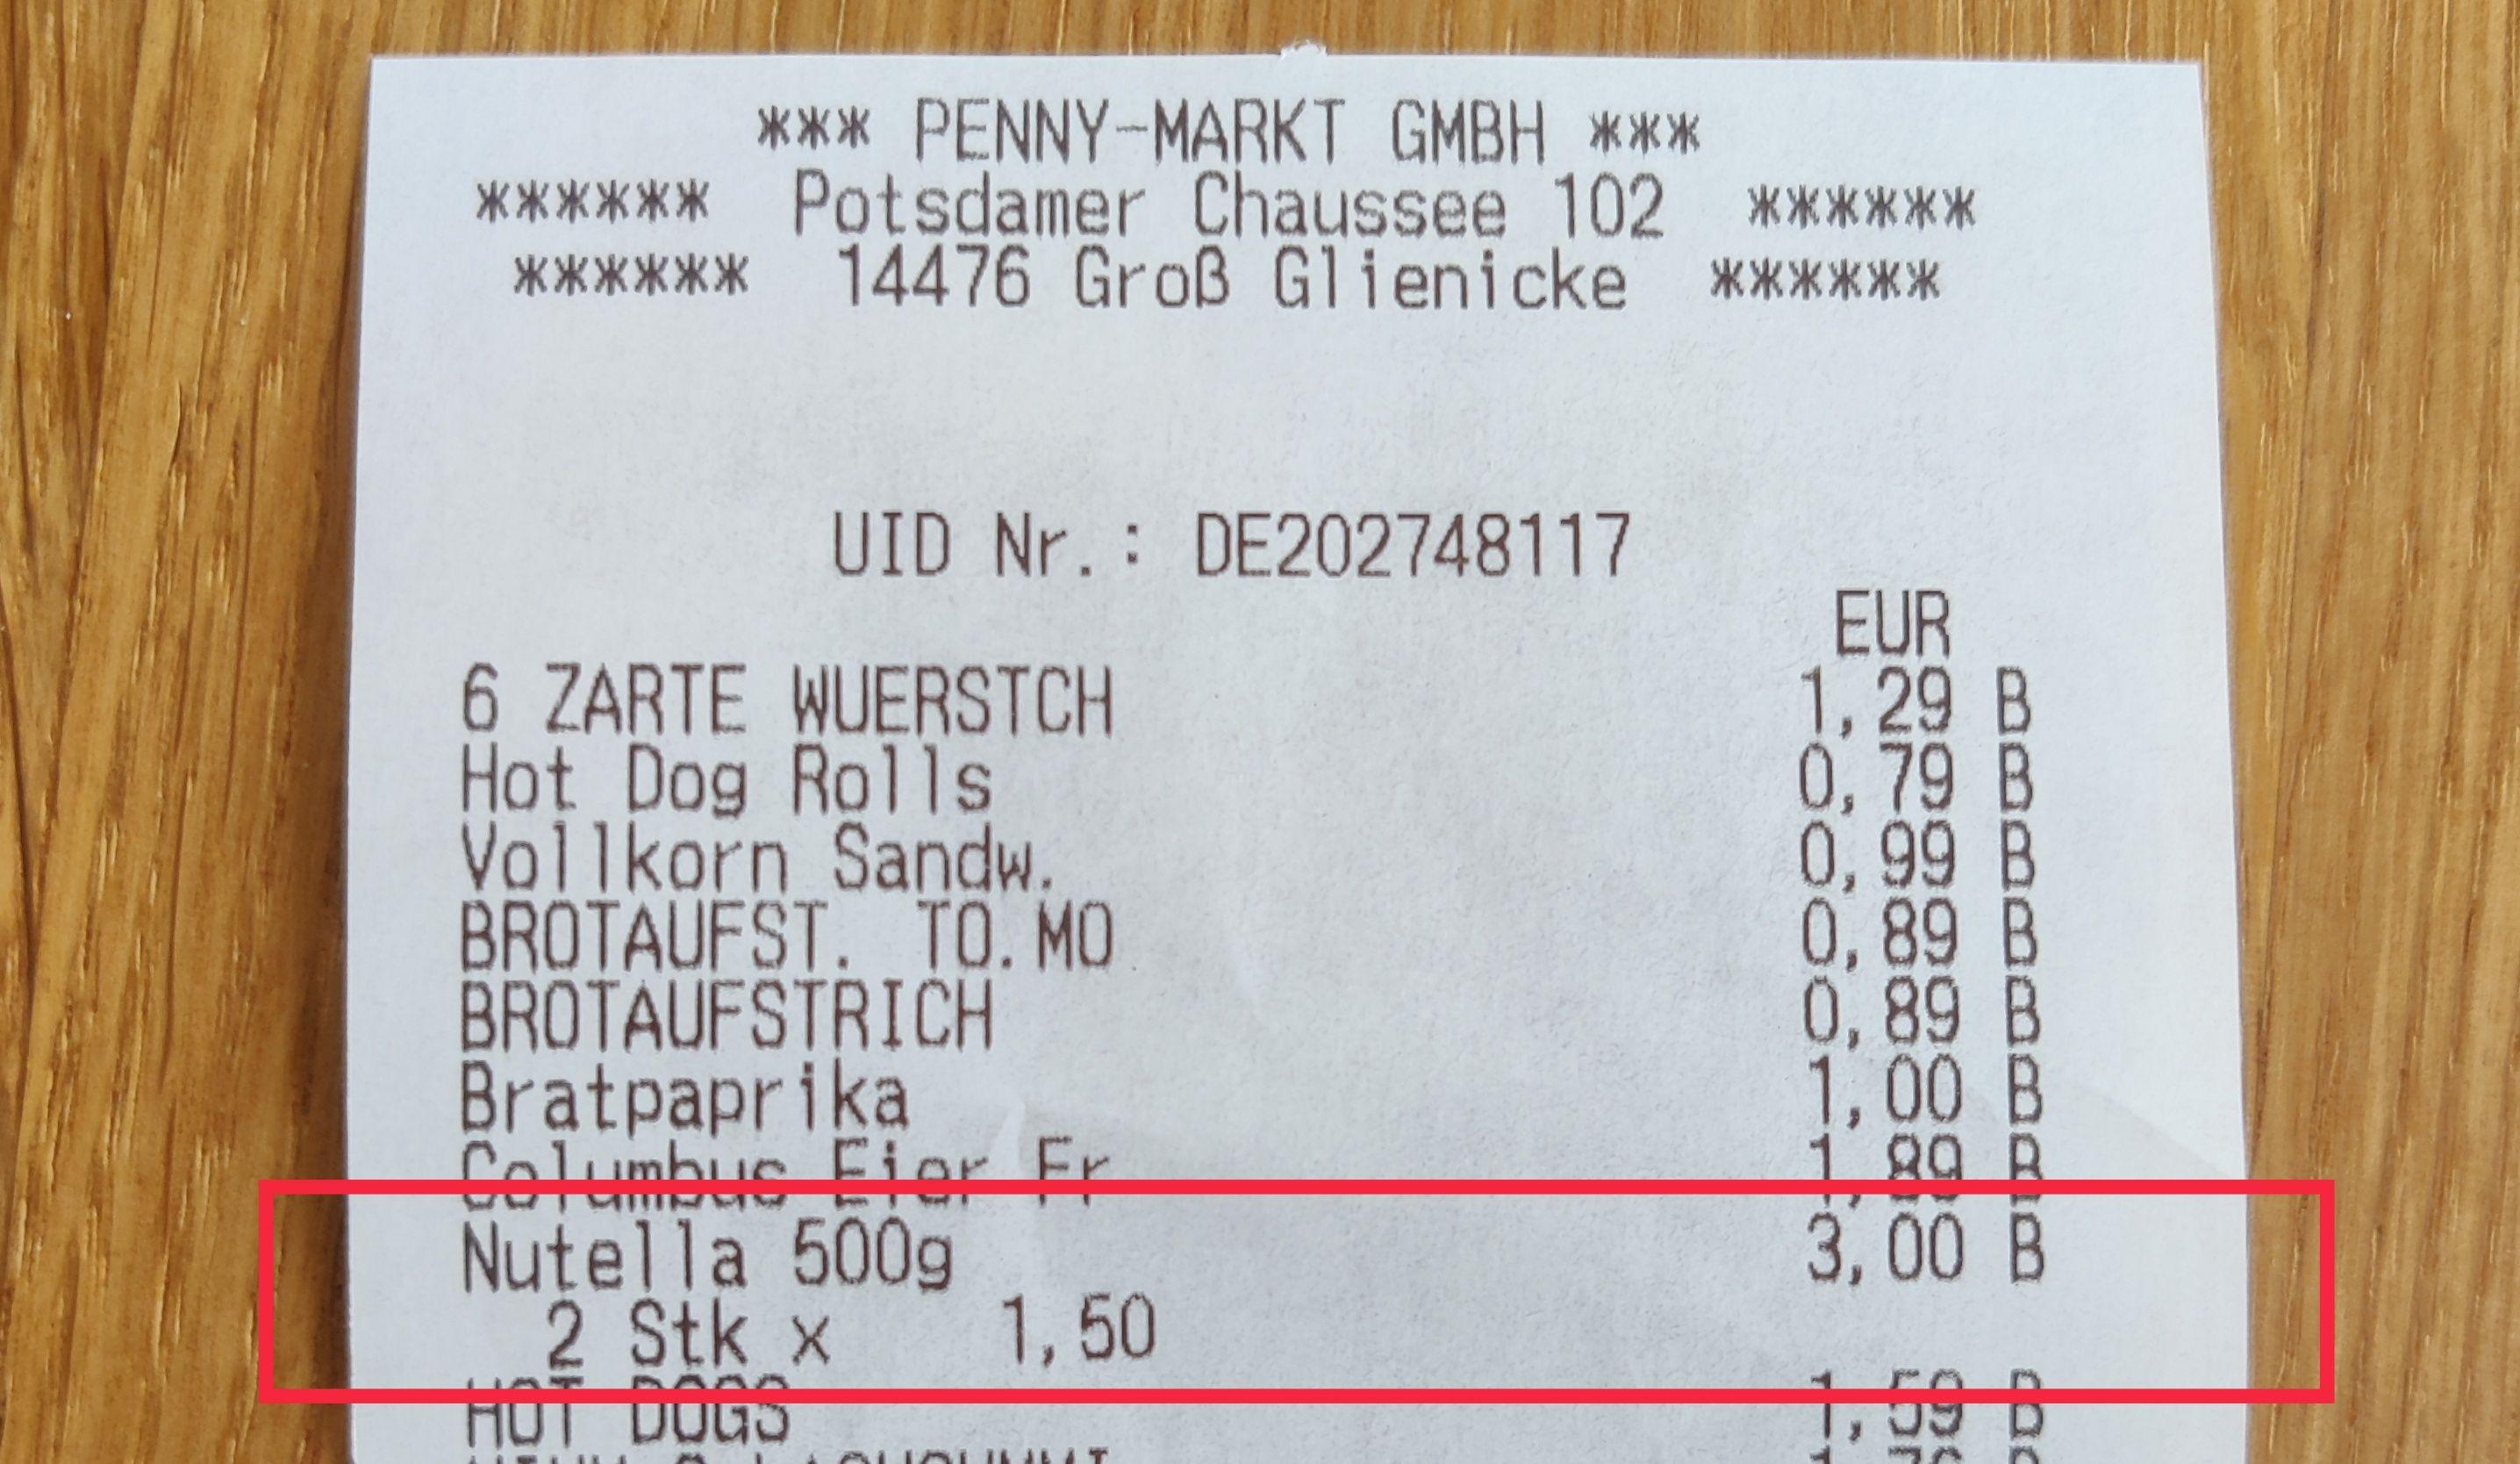 Nutella 500g [Lokal Penny Groß Glienicke]